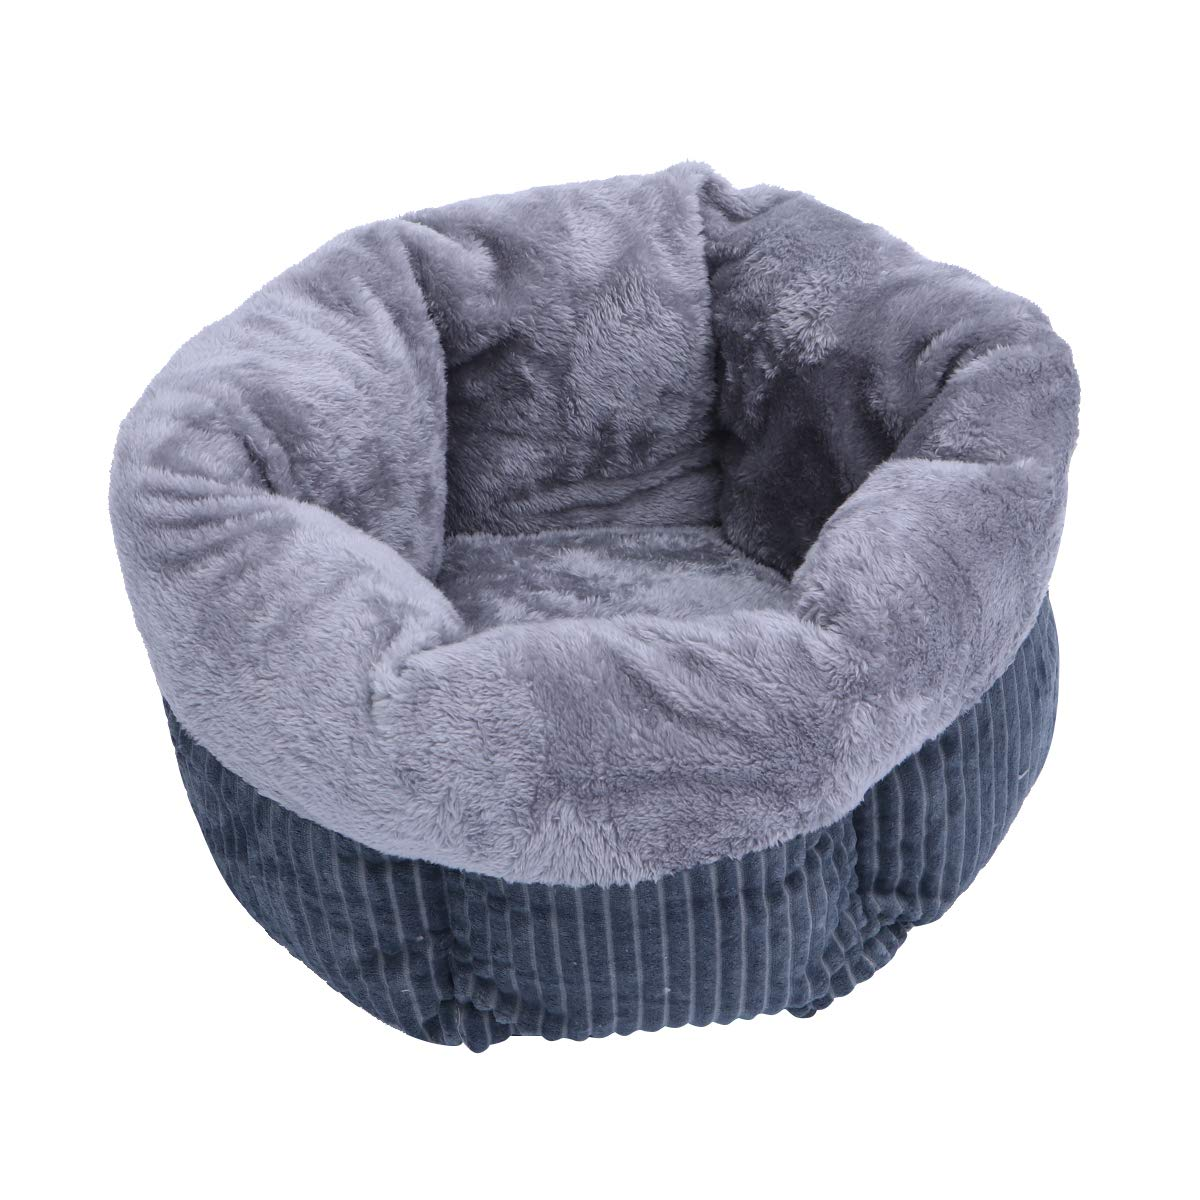 POPETPOP Pet Sleeping Bed Winter Velluto a Coste Caldo Velluto Letto rossoondo Nest Kennel Dog Cat Hous - Taglia M (Grigio)